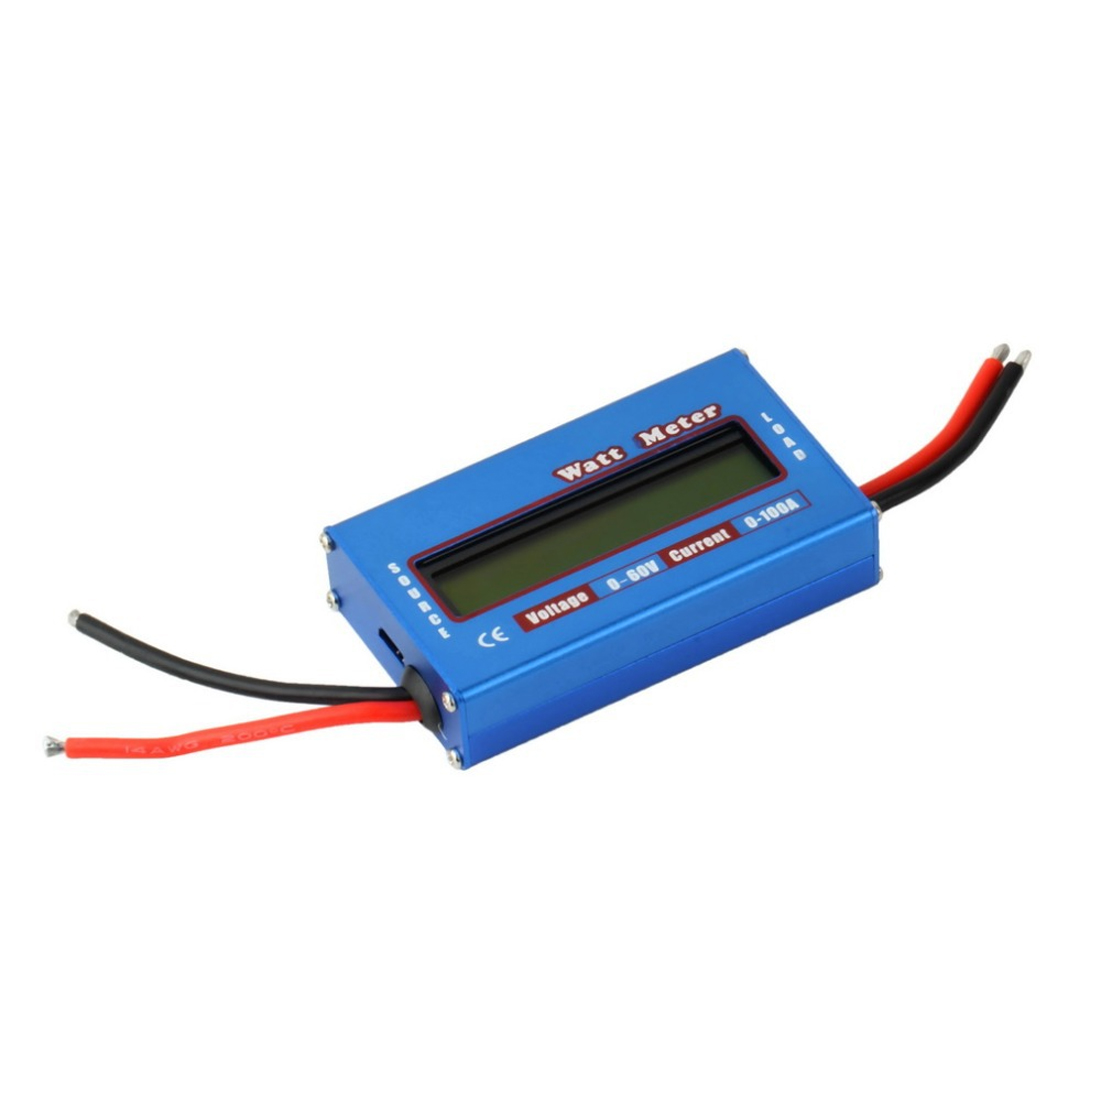 Analyzer Watt Meter Digital LCD For DC 60V/100A Balance Voltage RC Battery Power new 4 8v 60v 150a lcd g t power module rc watt meter tester and power analyzer high precision